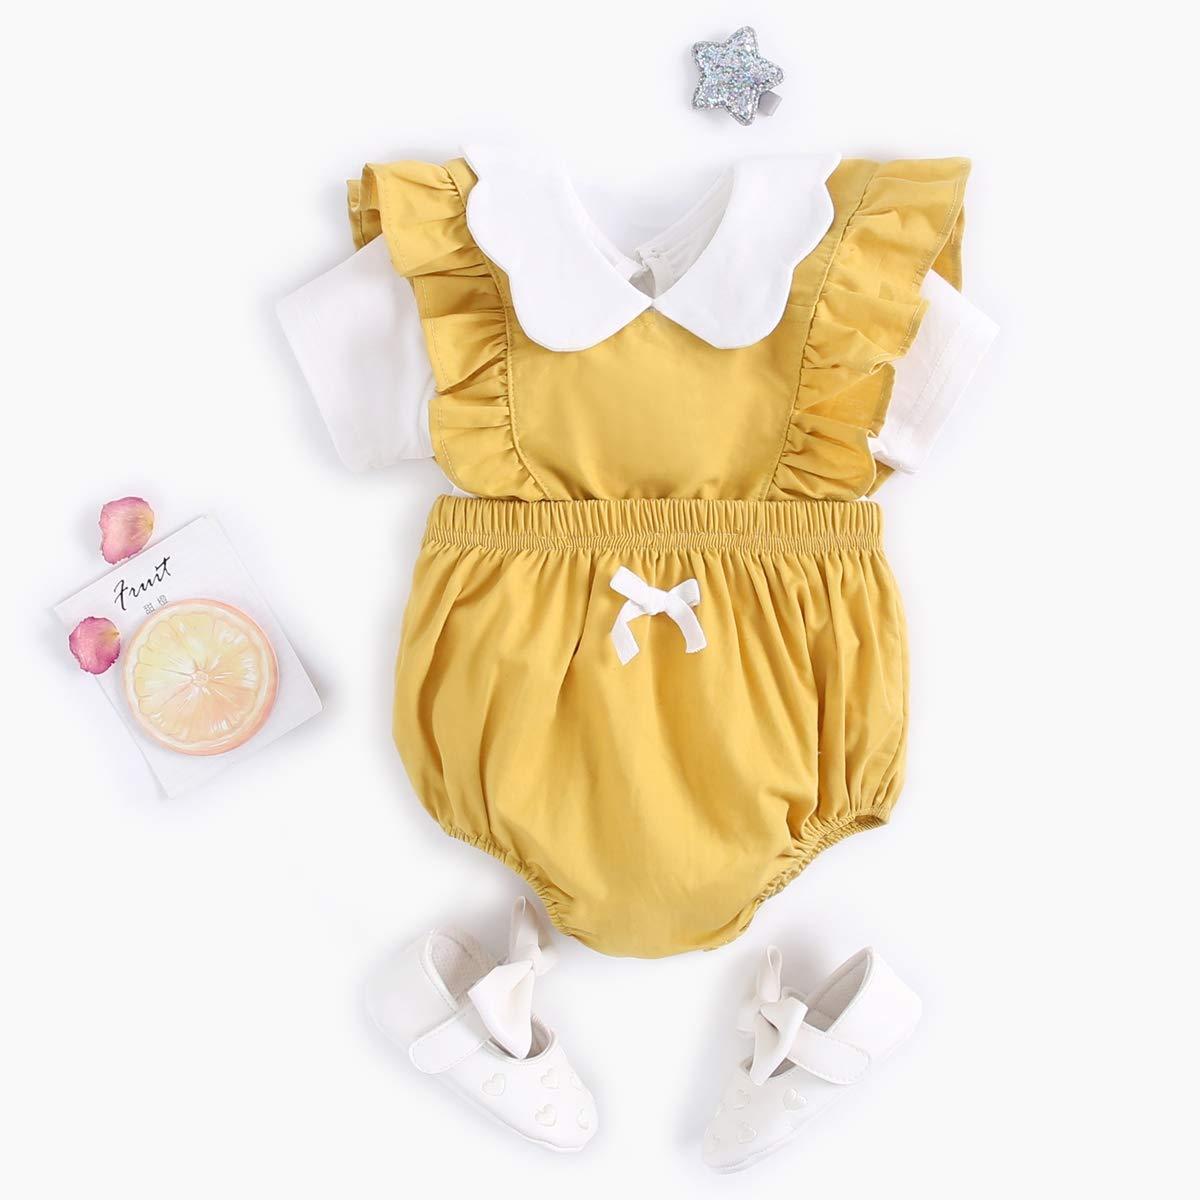 Rompers Sanlutoz Cotton Baby Girls Summer Clothing Set Fashion Newborn Baby T-Shirt